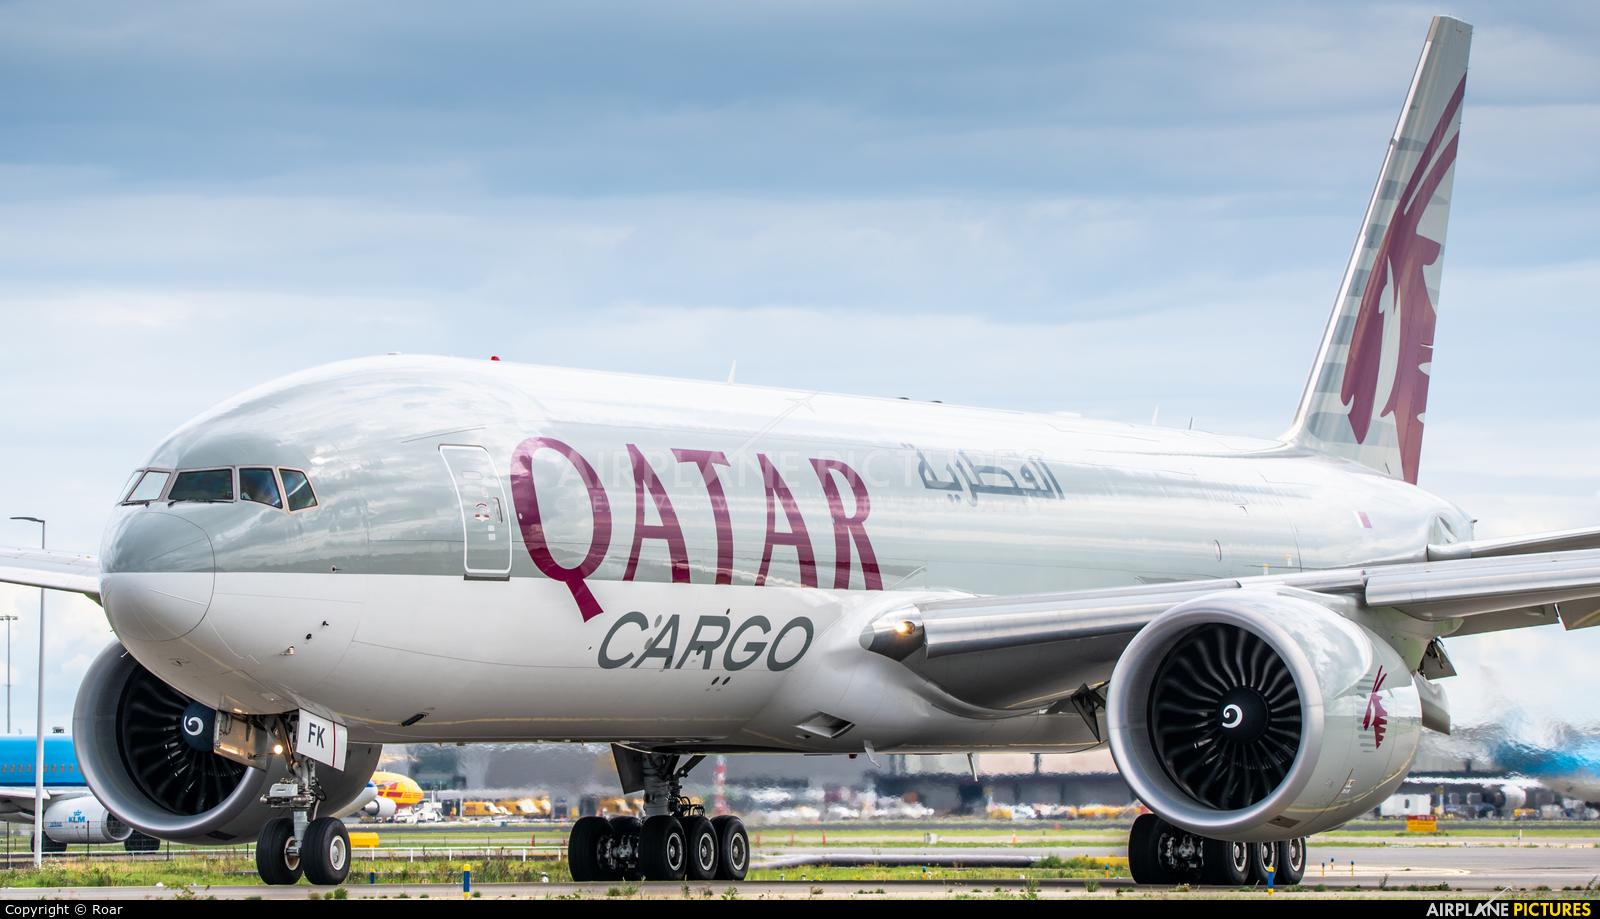 Qatar Airways Cargo A7-BFK aircraft at Amsterdam - Schiphol